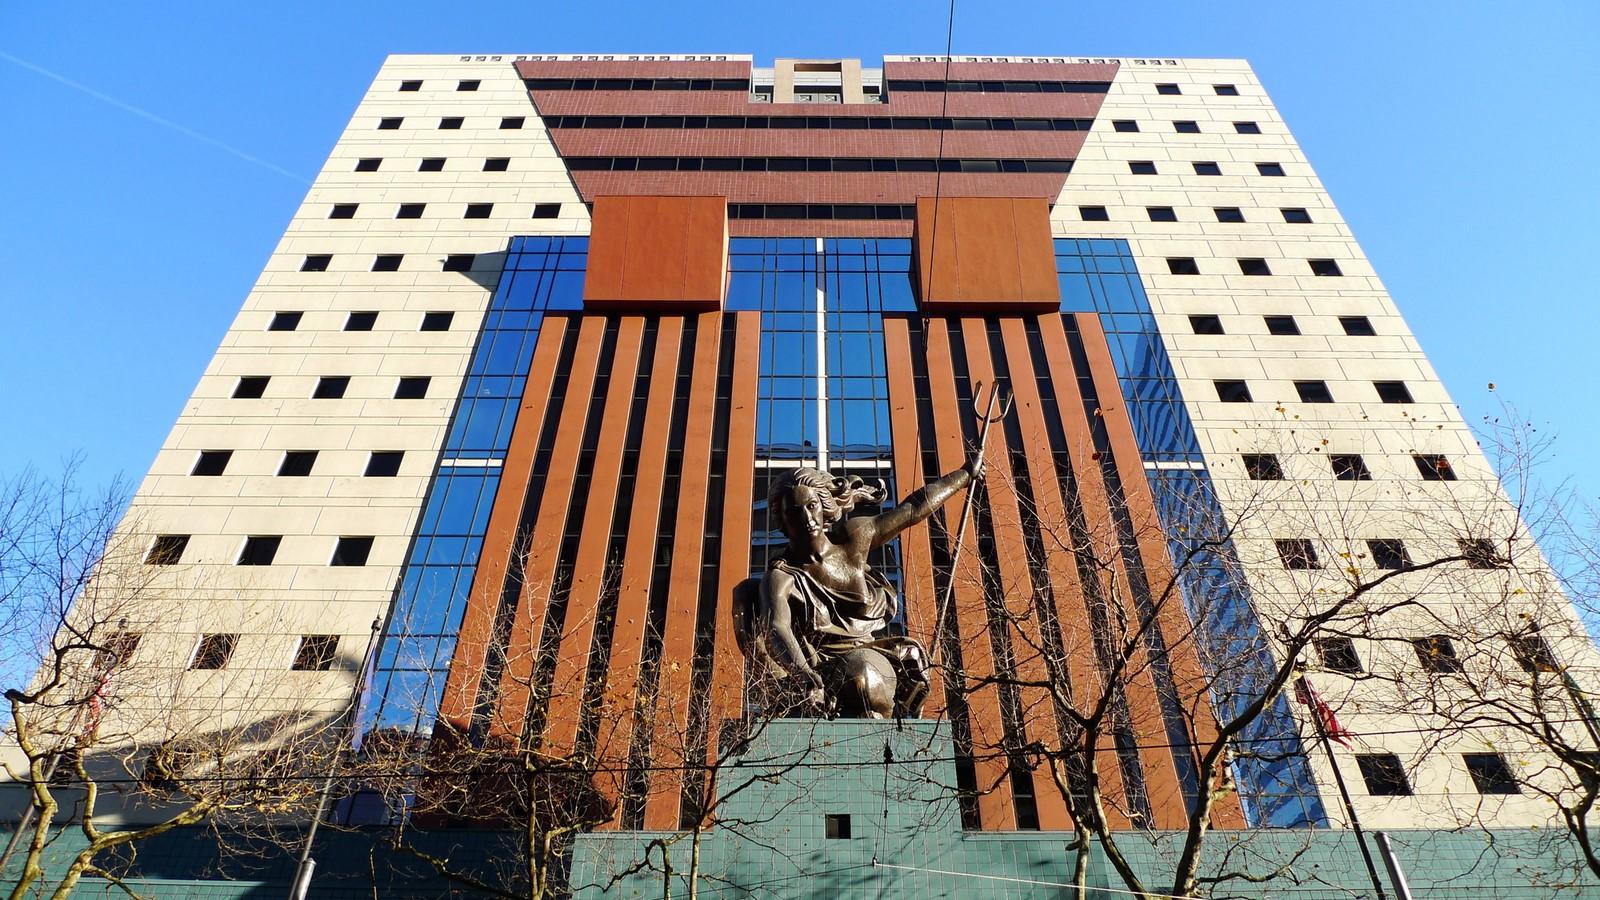 The Portland Building, Portland, USA - Sheet1